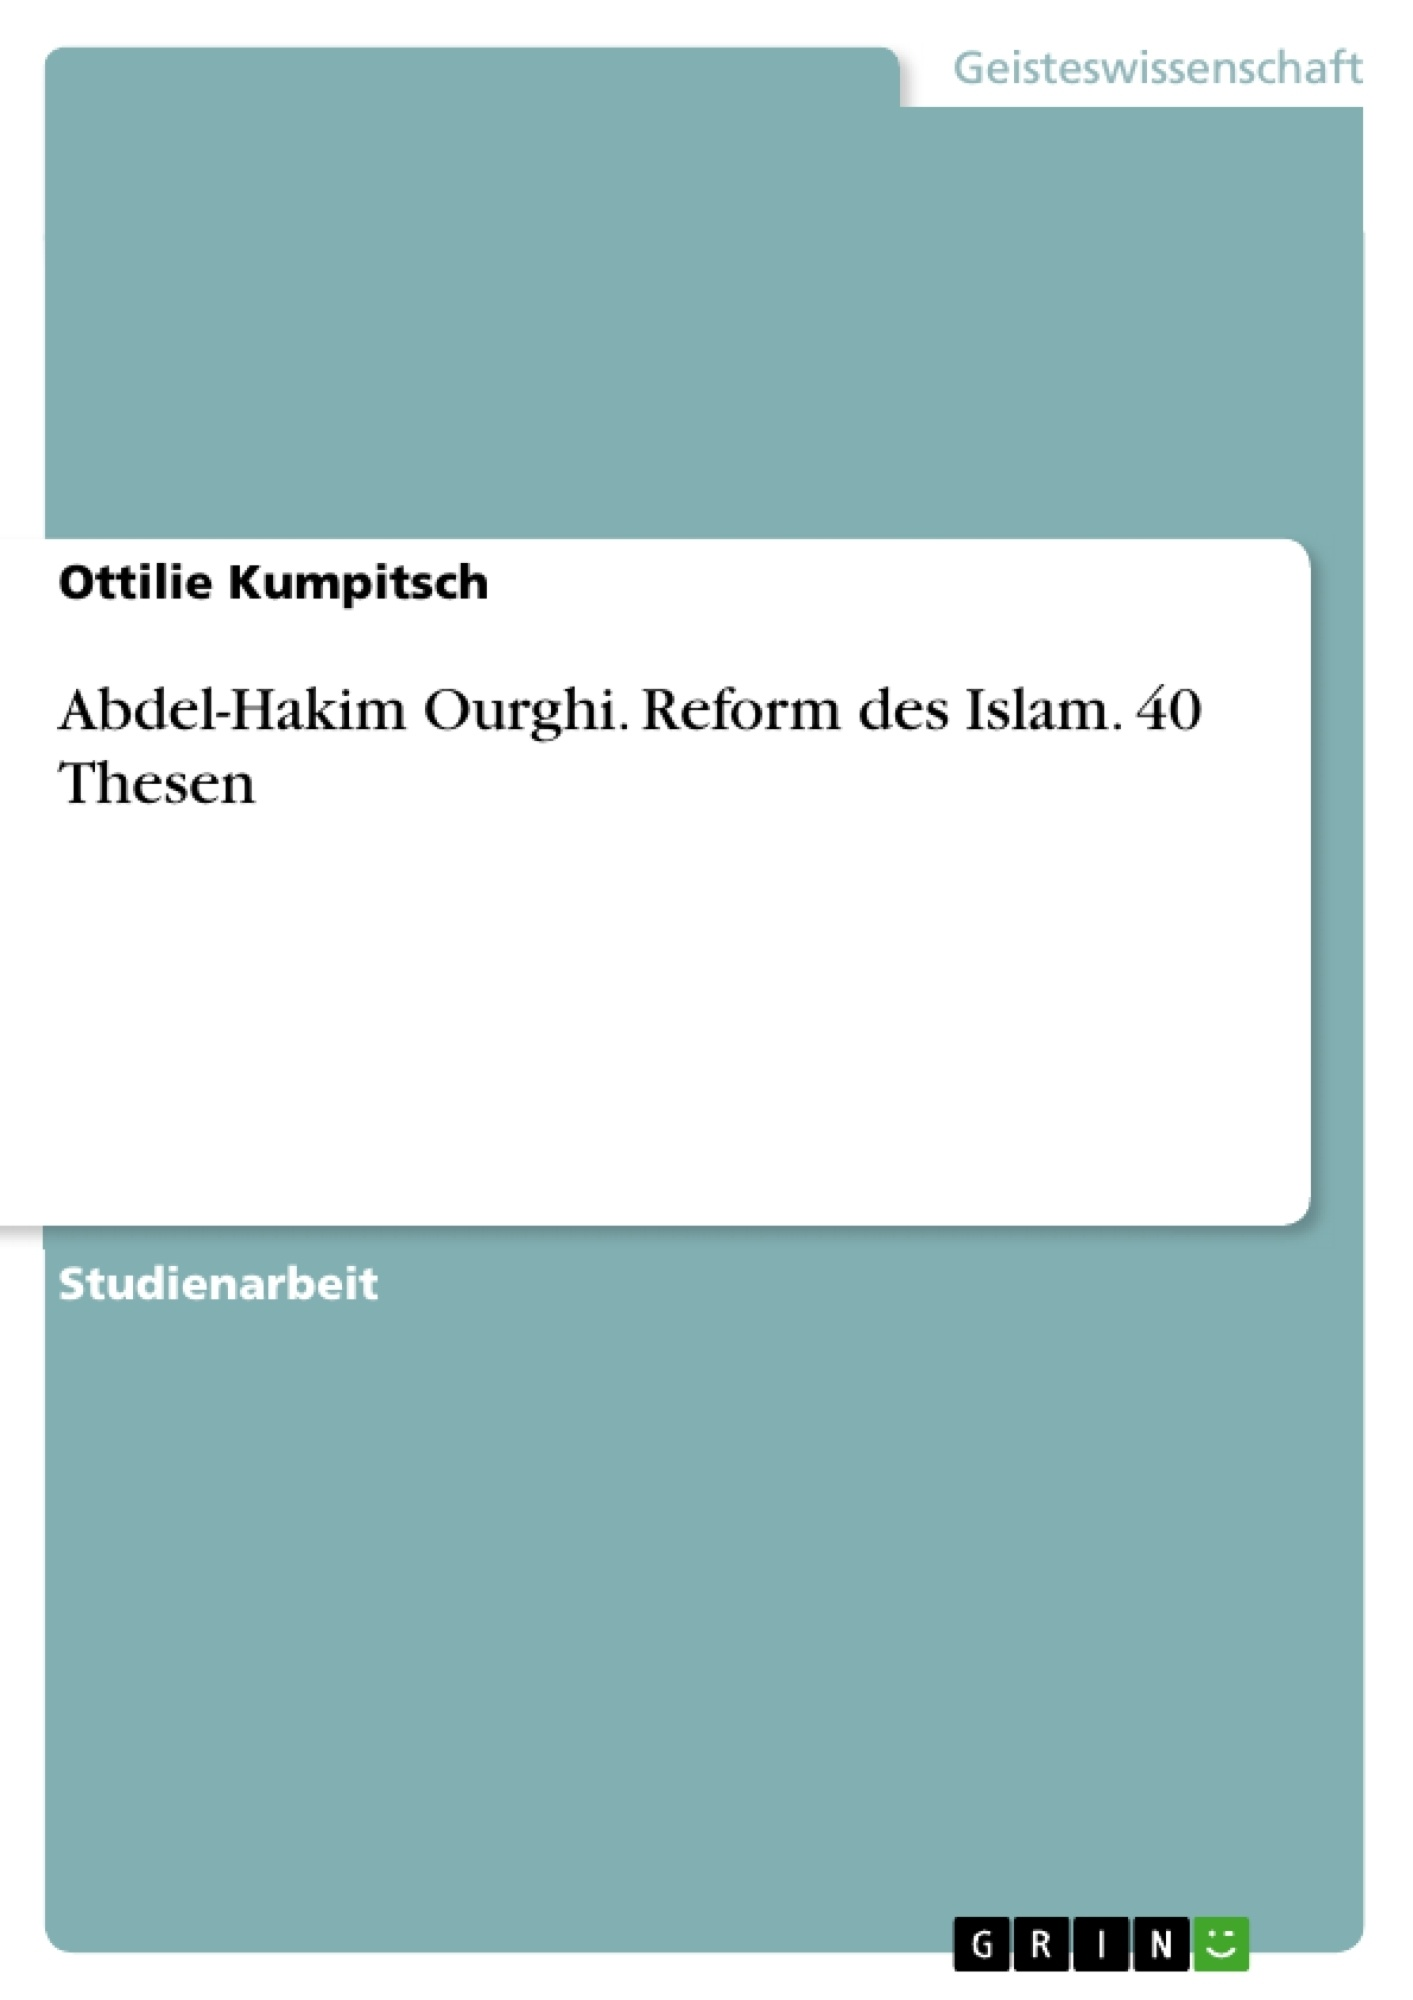 Titel: Abdel-Hakim Ourghi. Reform des Islam. 40 Thesen